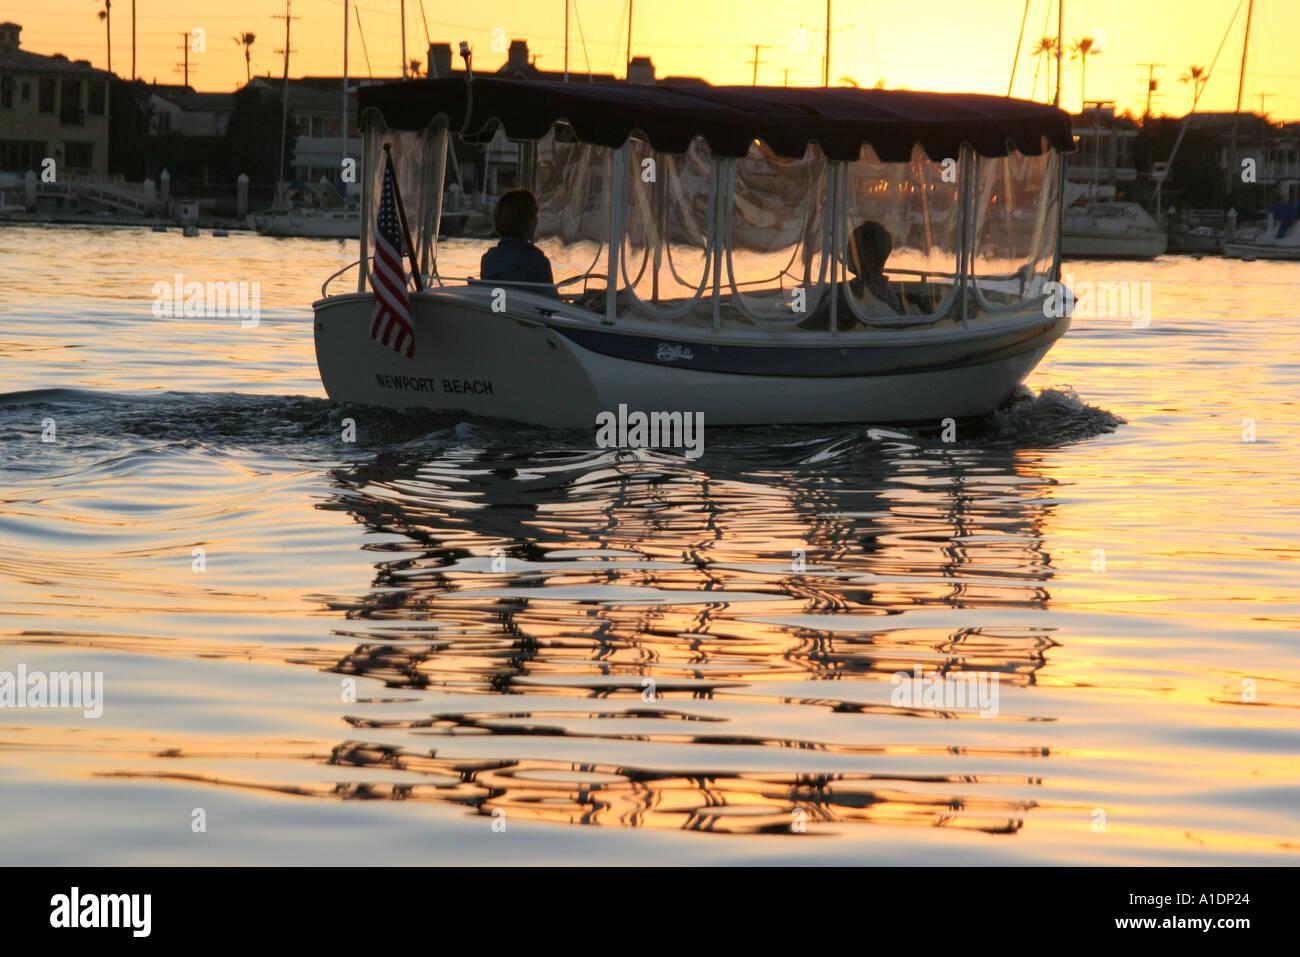 Newport Beach On Orange County Stock Photos Newport Beach